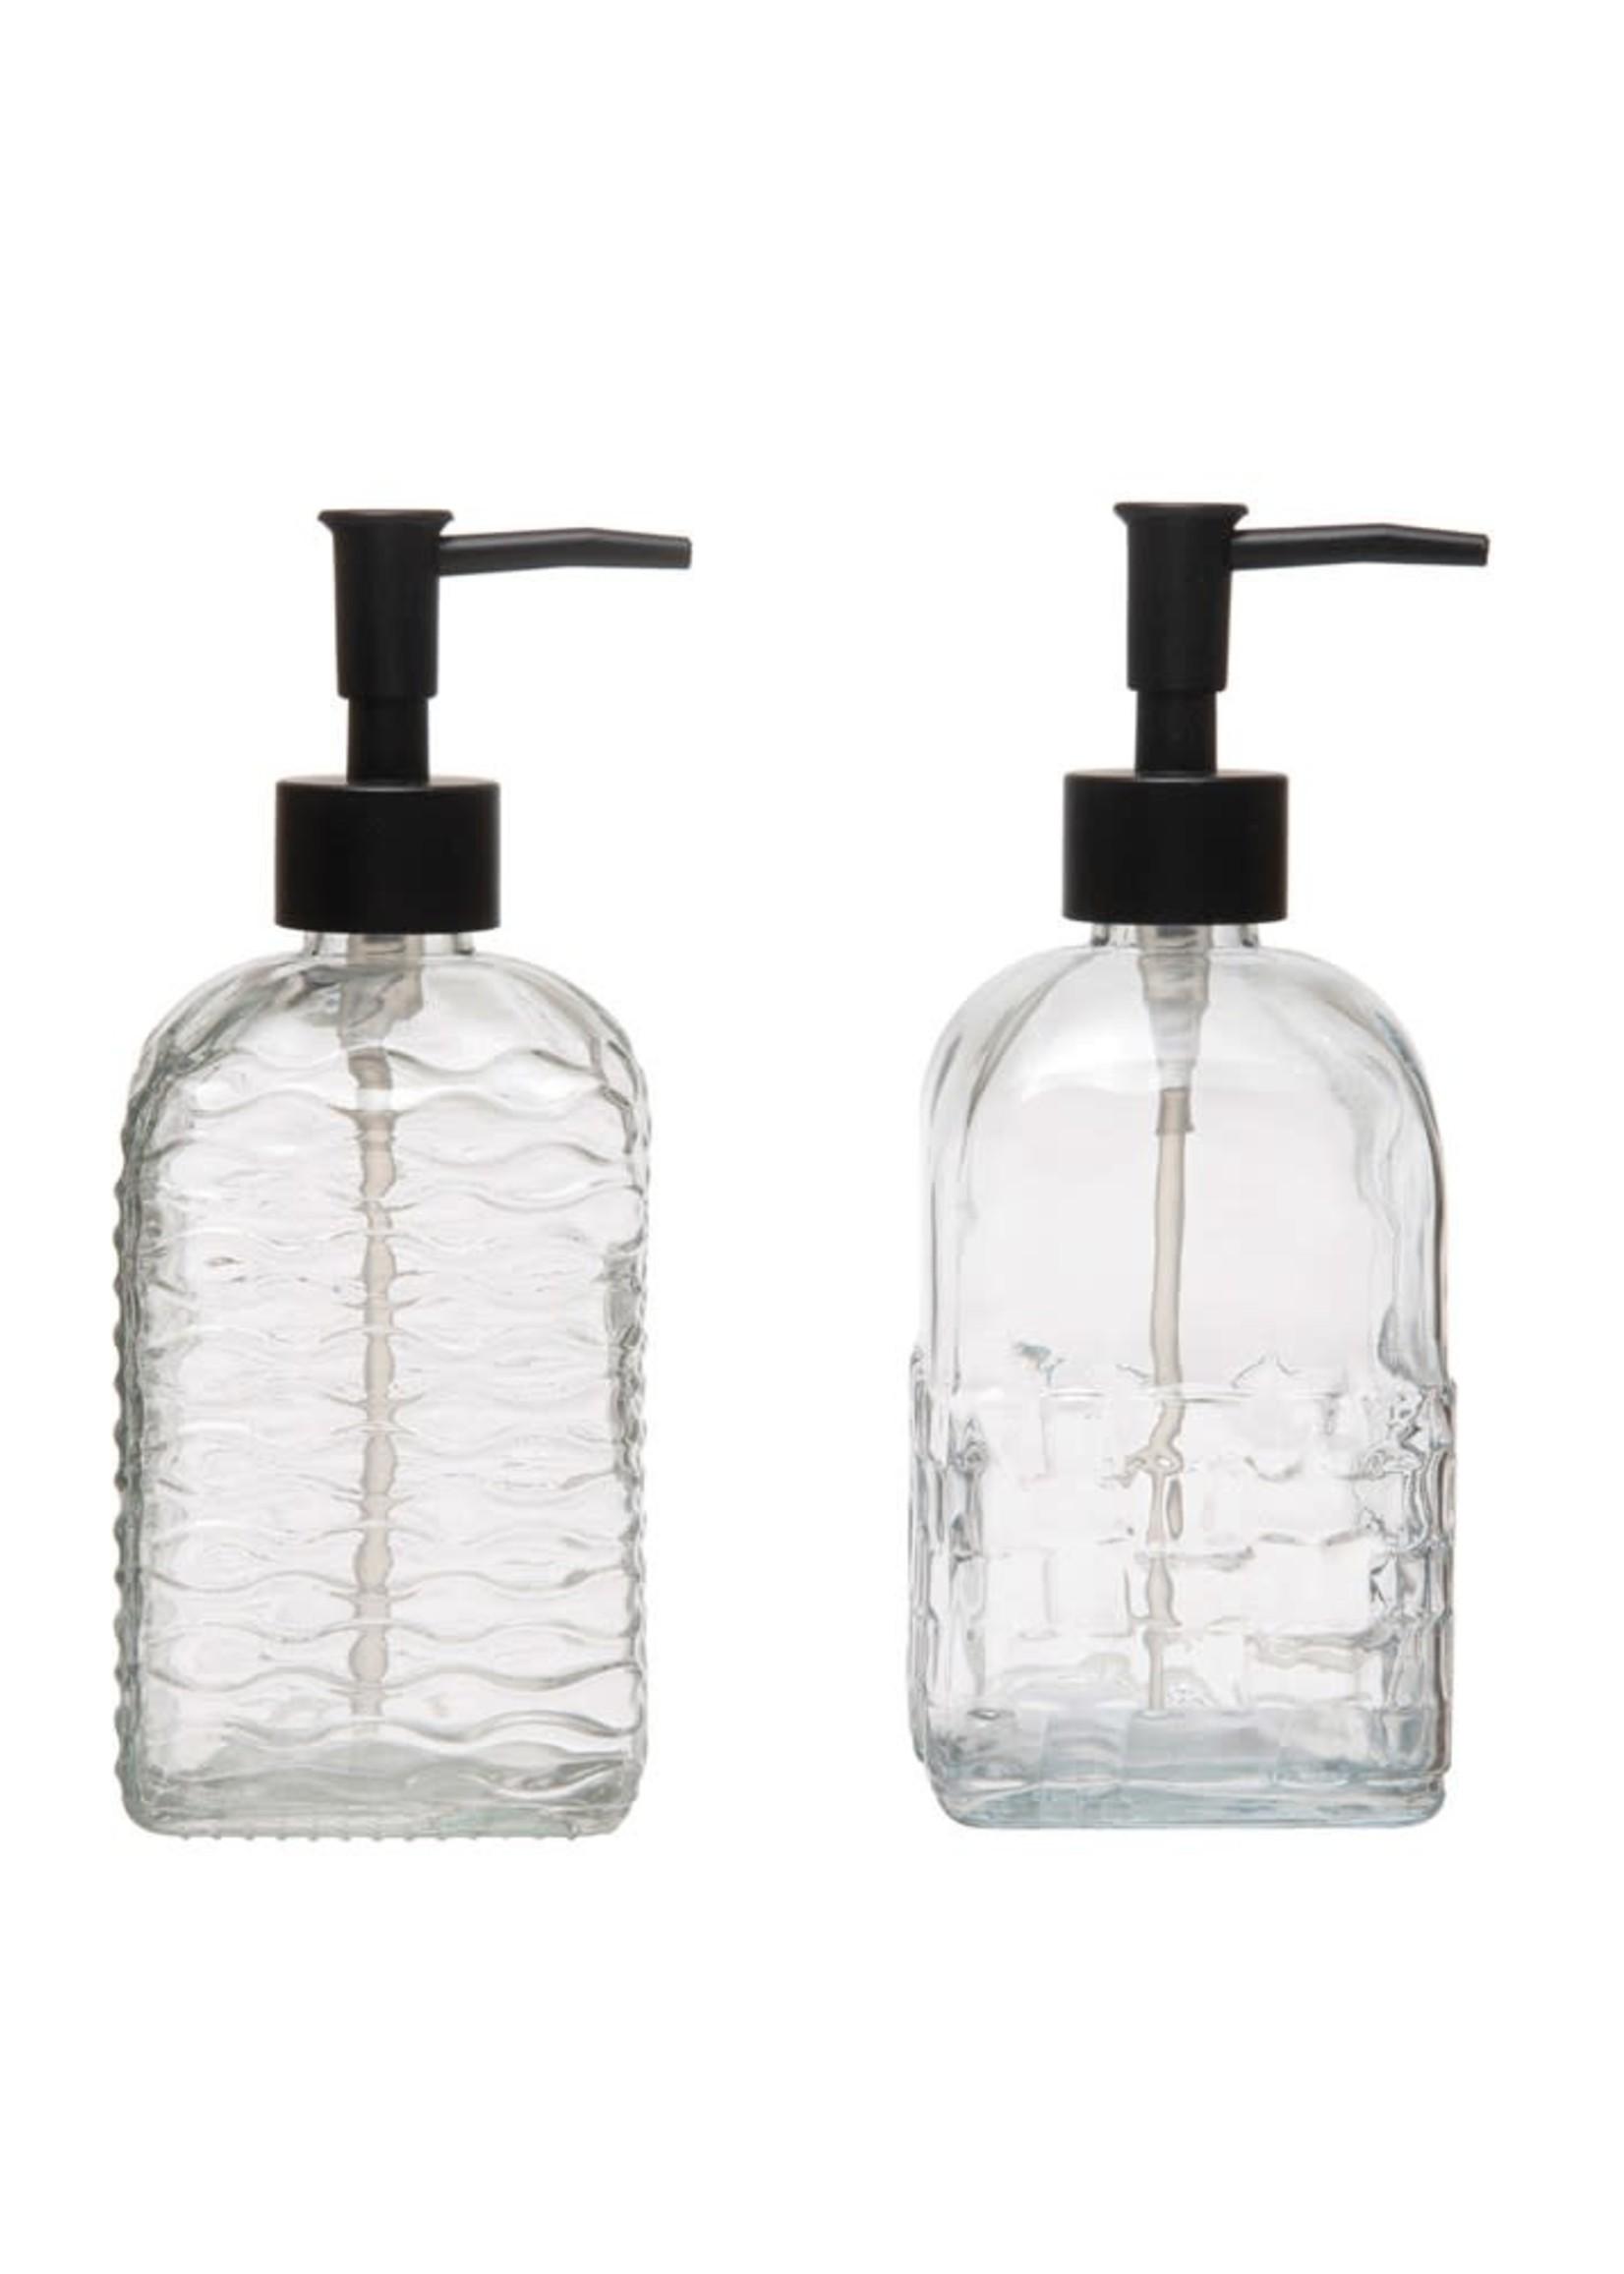 Embossed Glass Soap Dispenser w/ Pump, 2 Styles